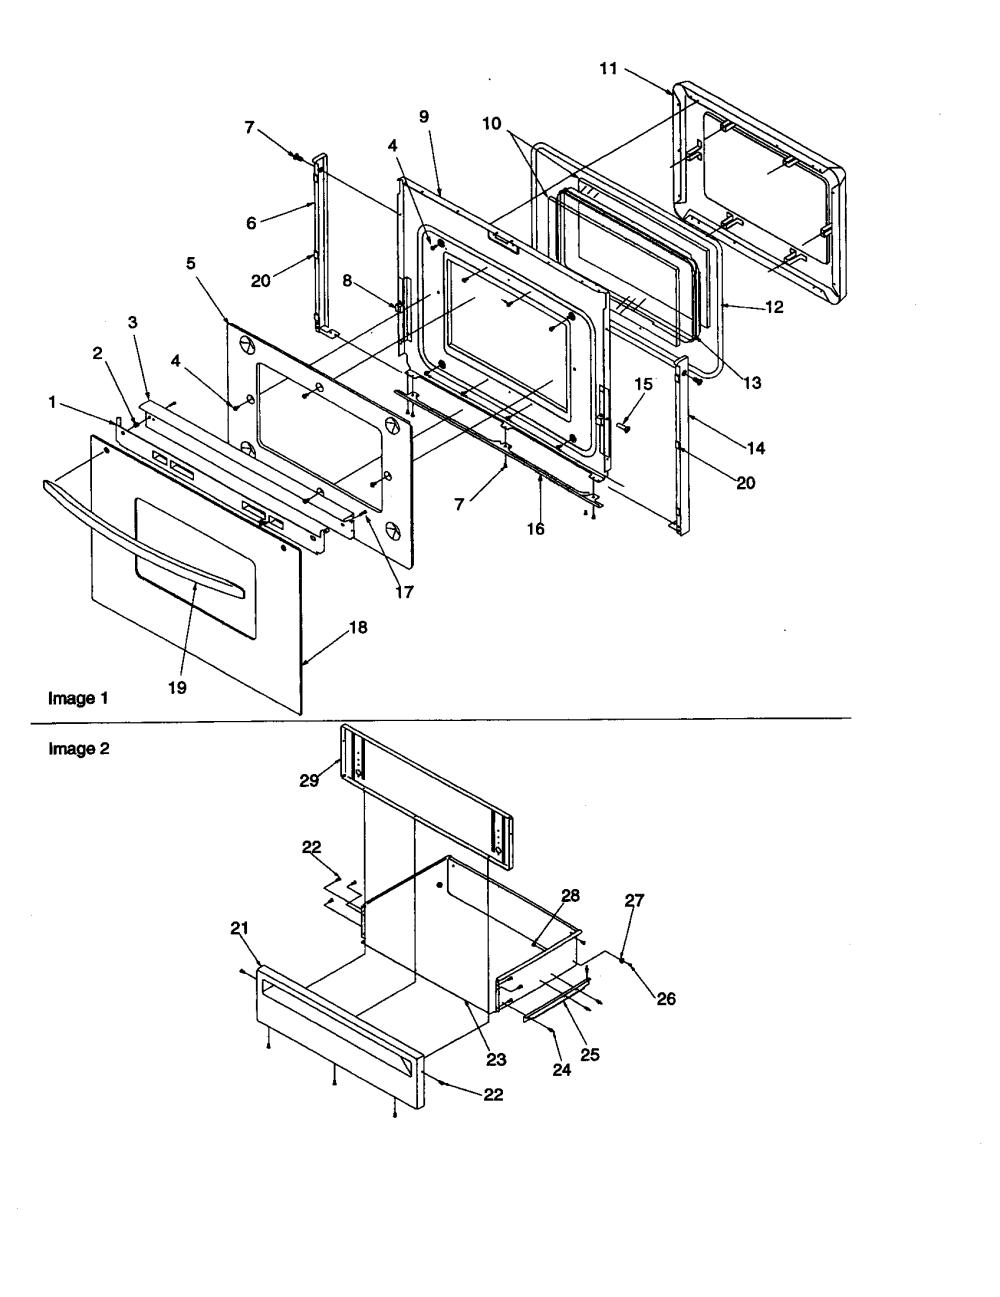 medium resolution of artc7511ww electric range oven door and storage drawer parts diagram